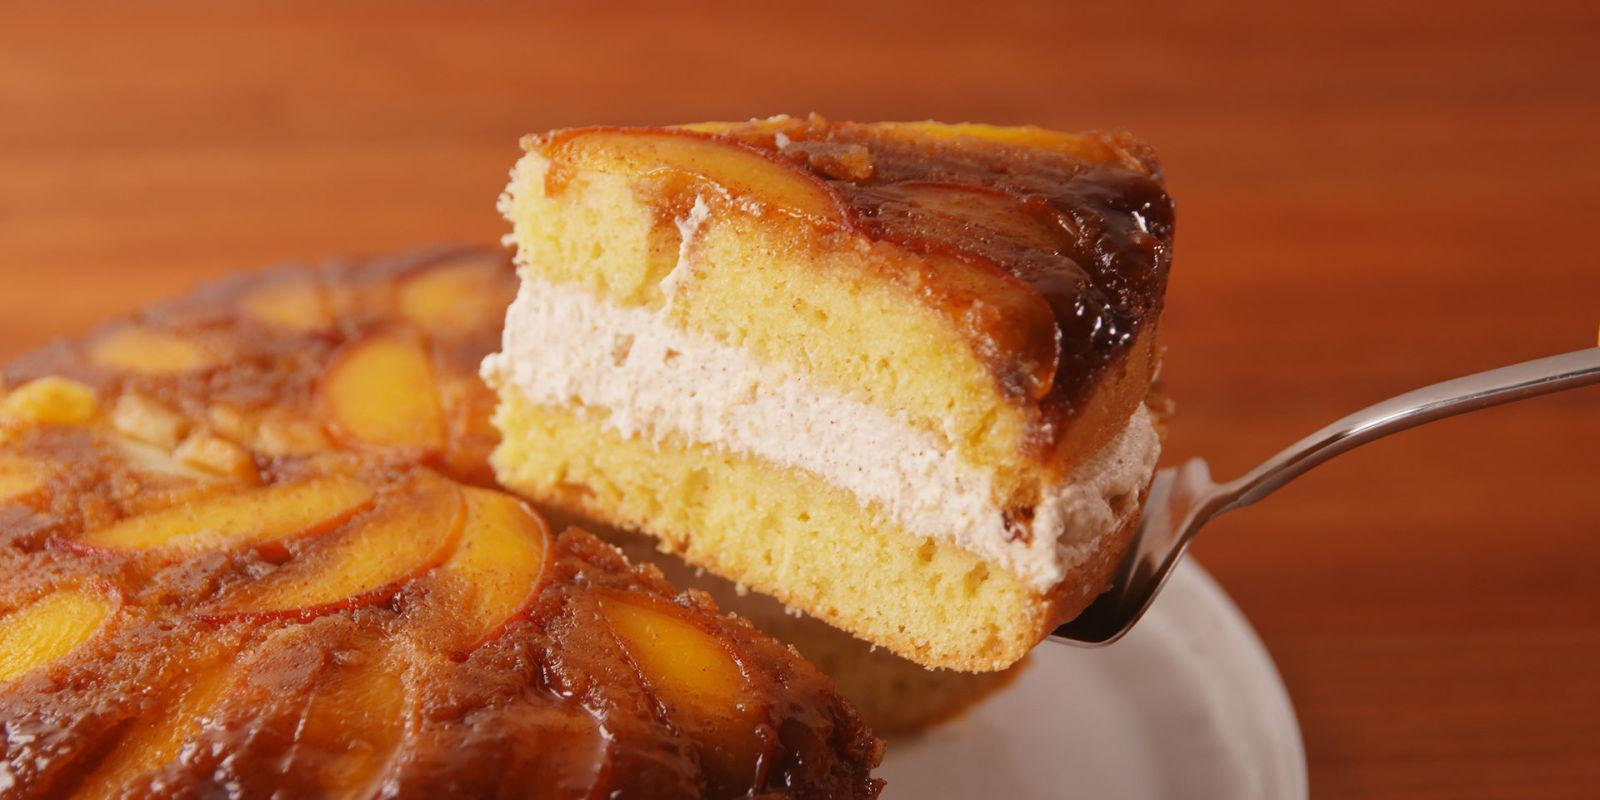 Recipes peach upside down cake using cake mix